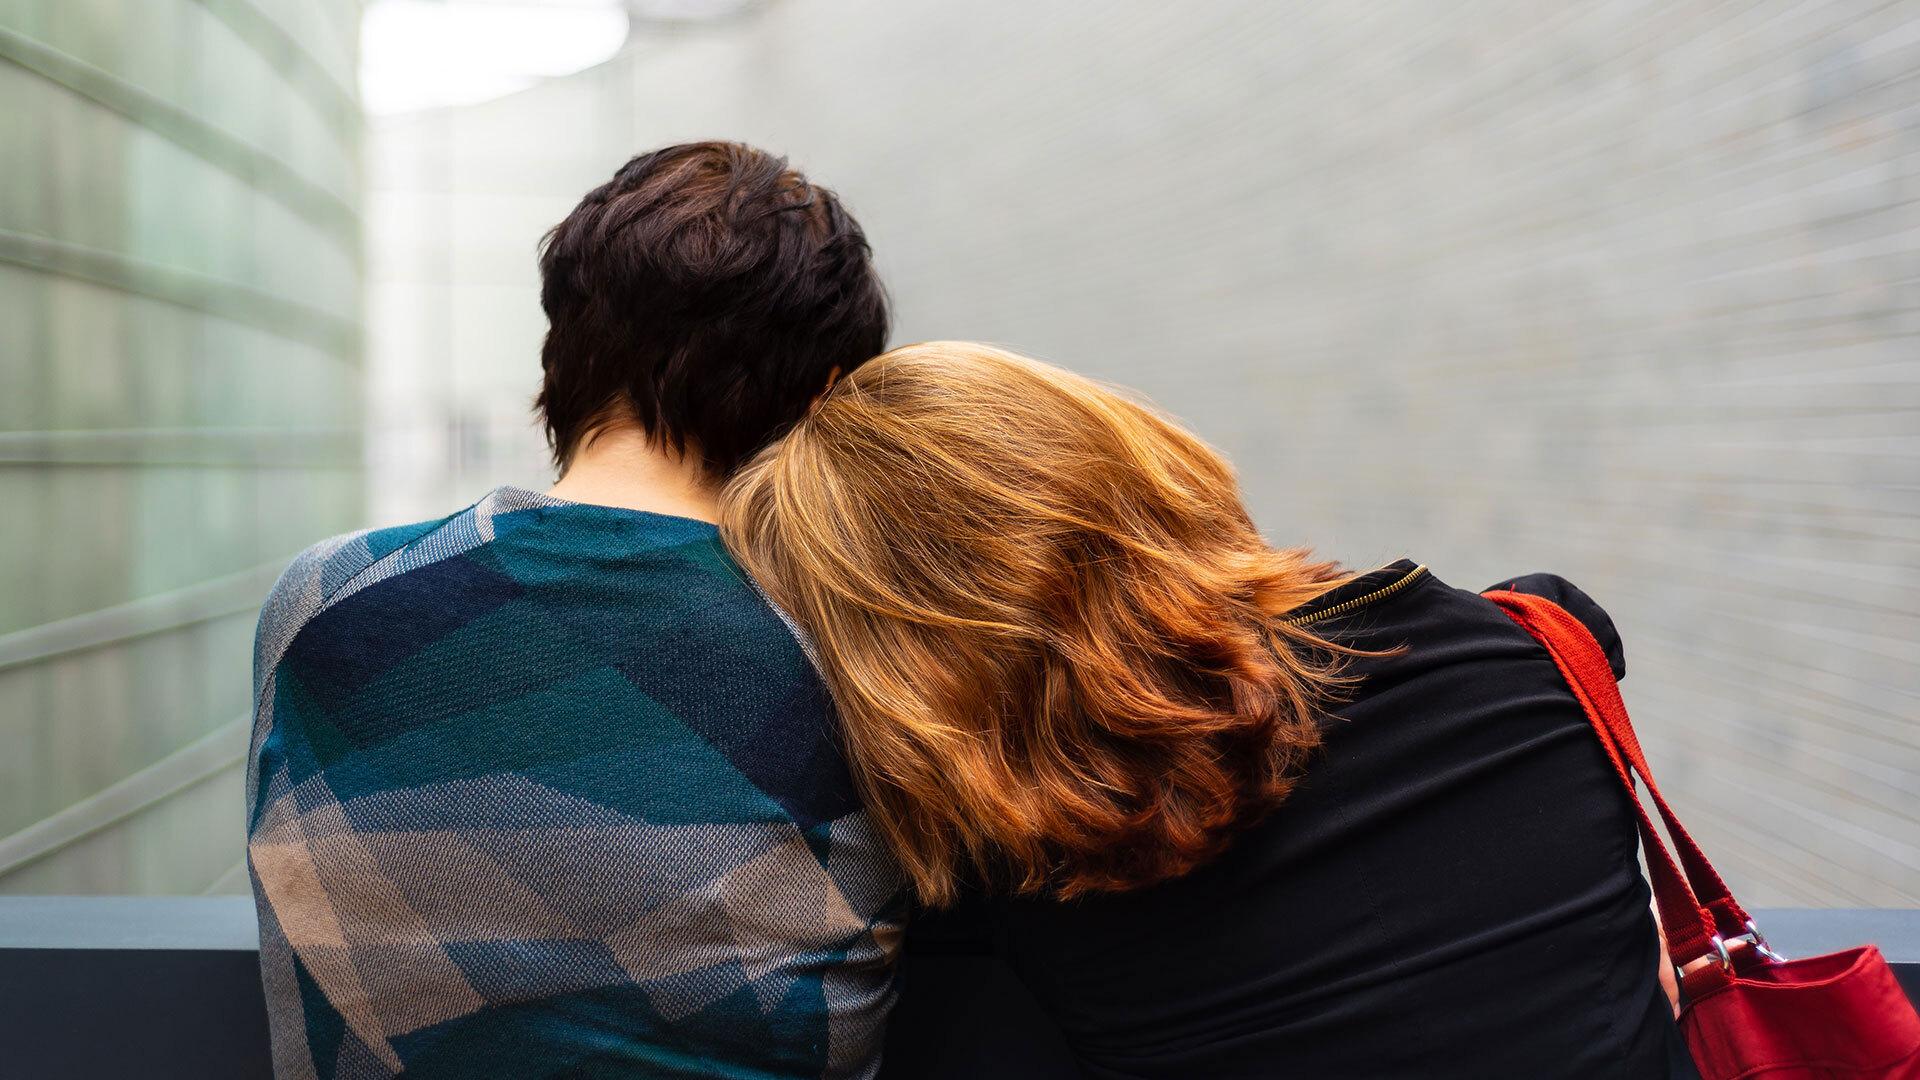 MVH Suicide Awareness and Prevention Global Webinar